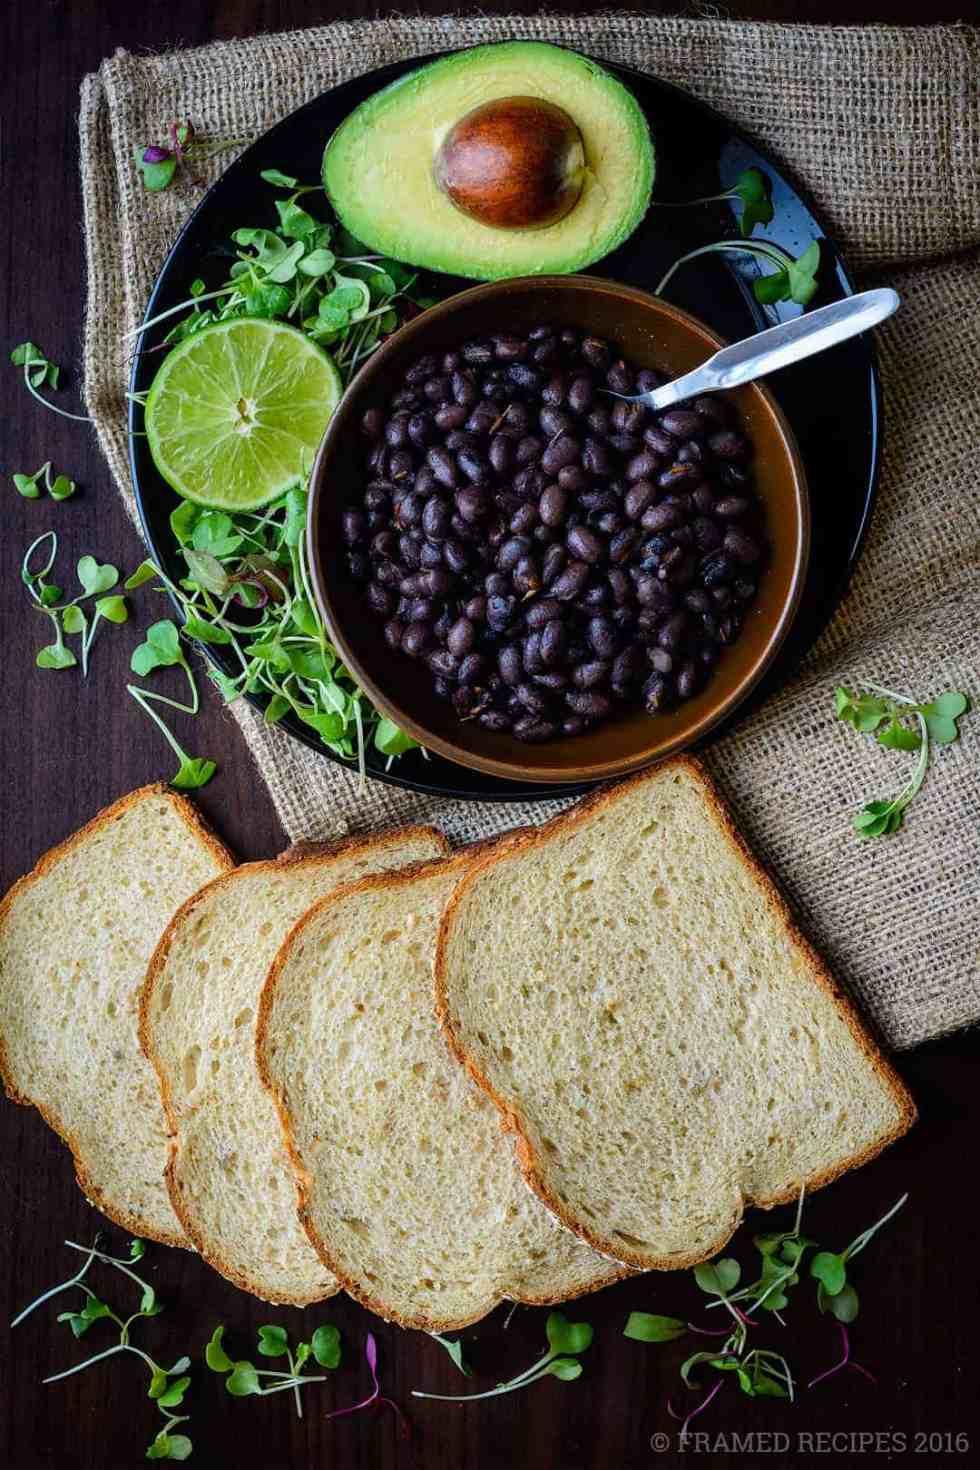 ingredients to prepare avocado toast -  bread slices, lemon, microgreens, whole avocado, black beans.